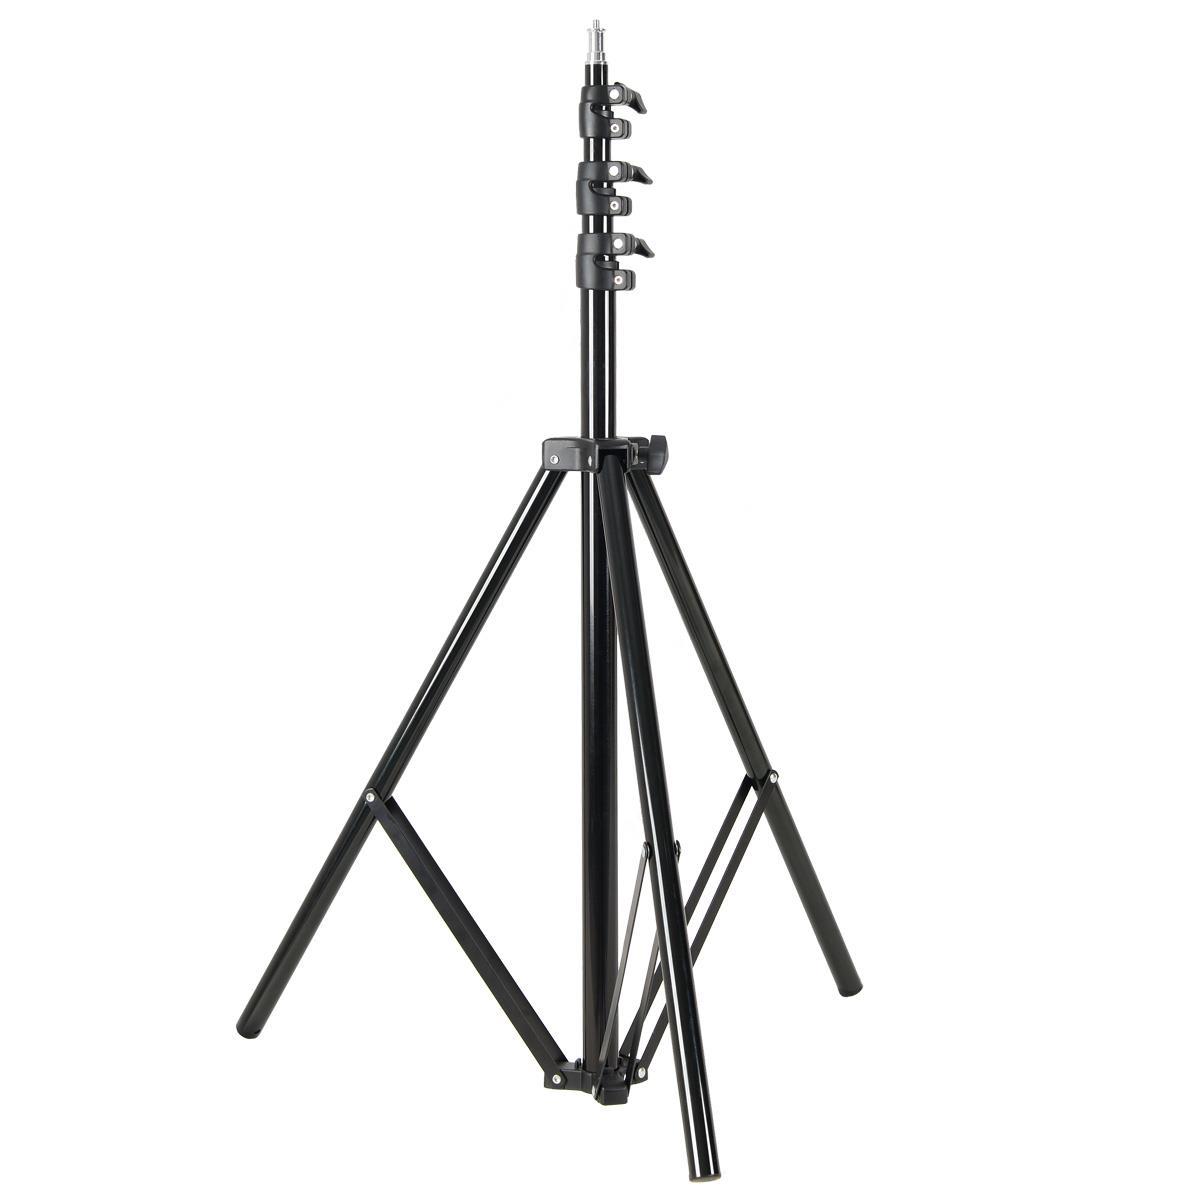 "Godox 290F Heavy-Duty Light Stand (9.3"")"